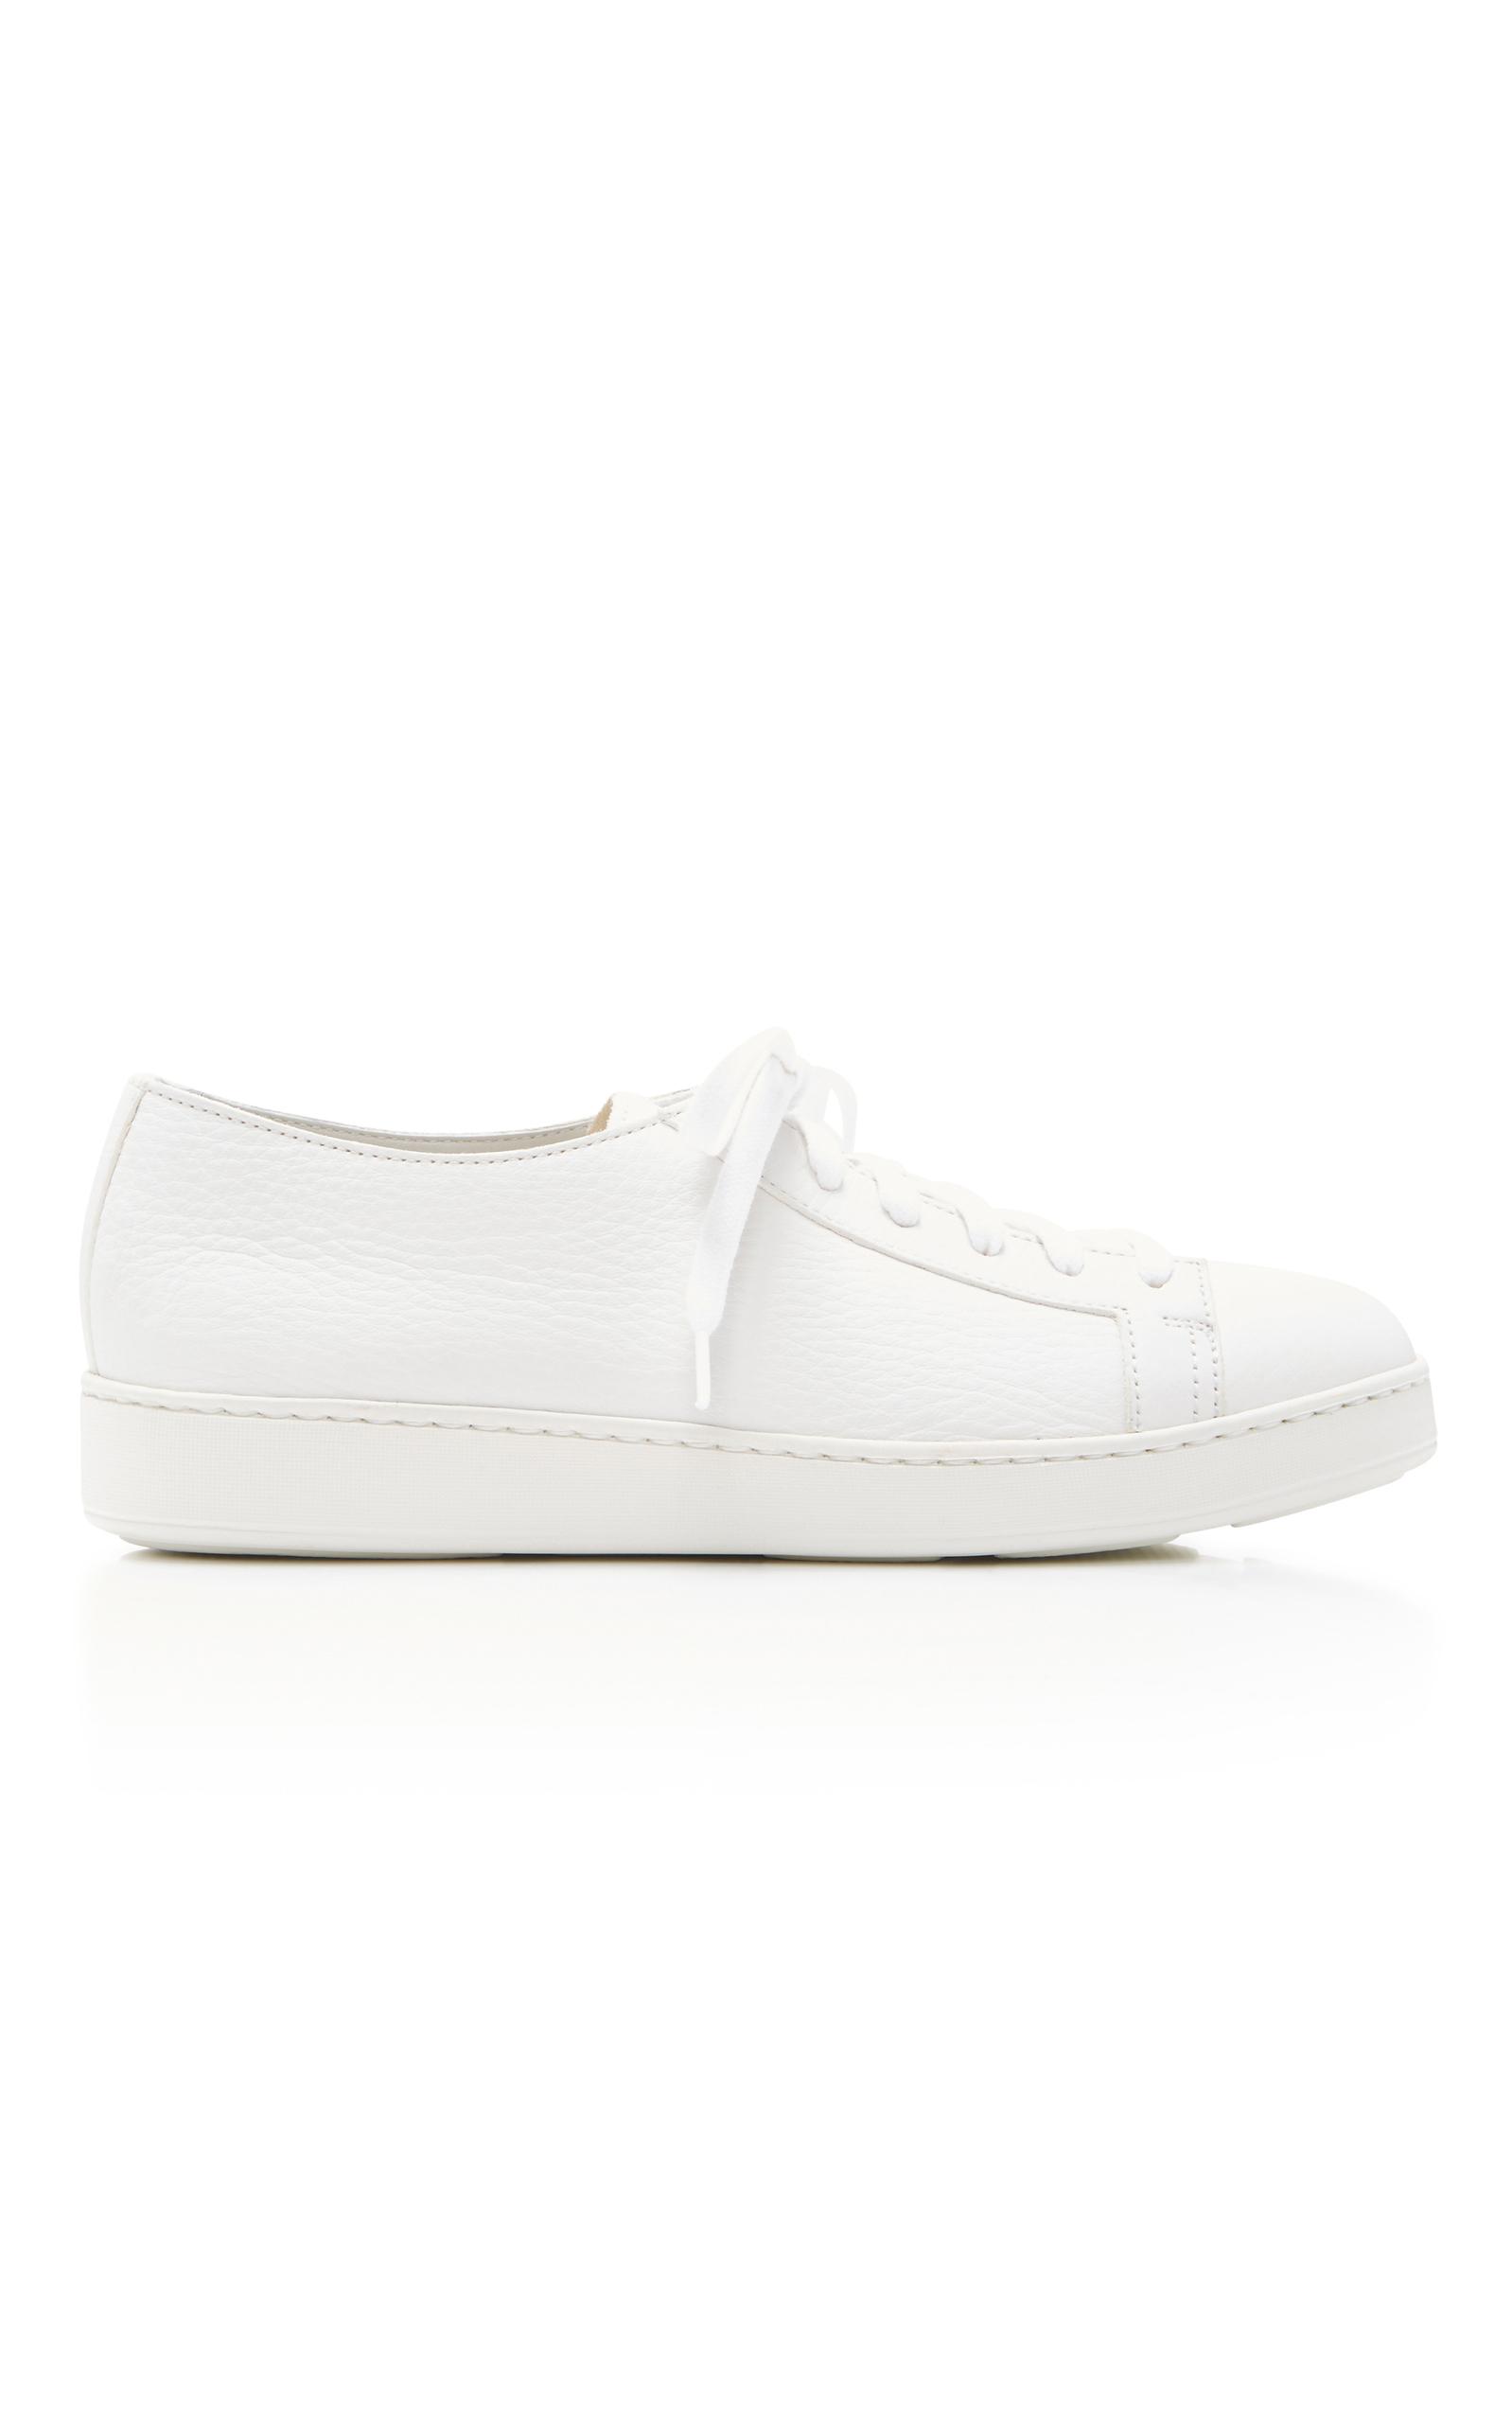 Sneakers off-white Santoni eI6mI